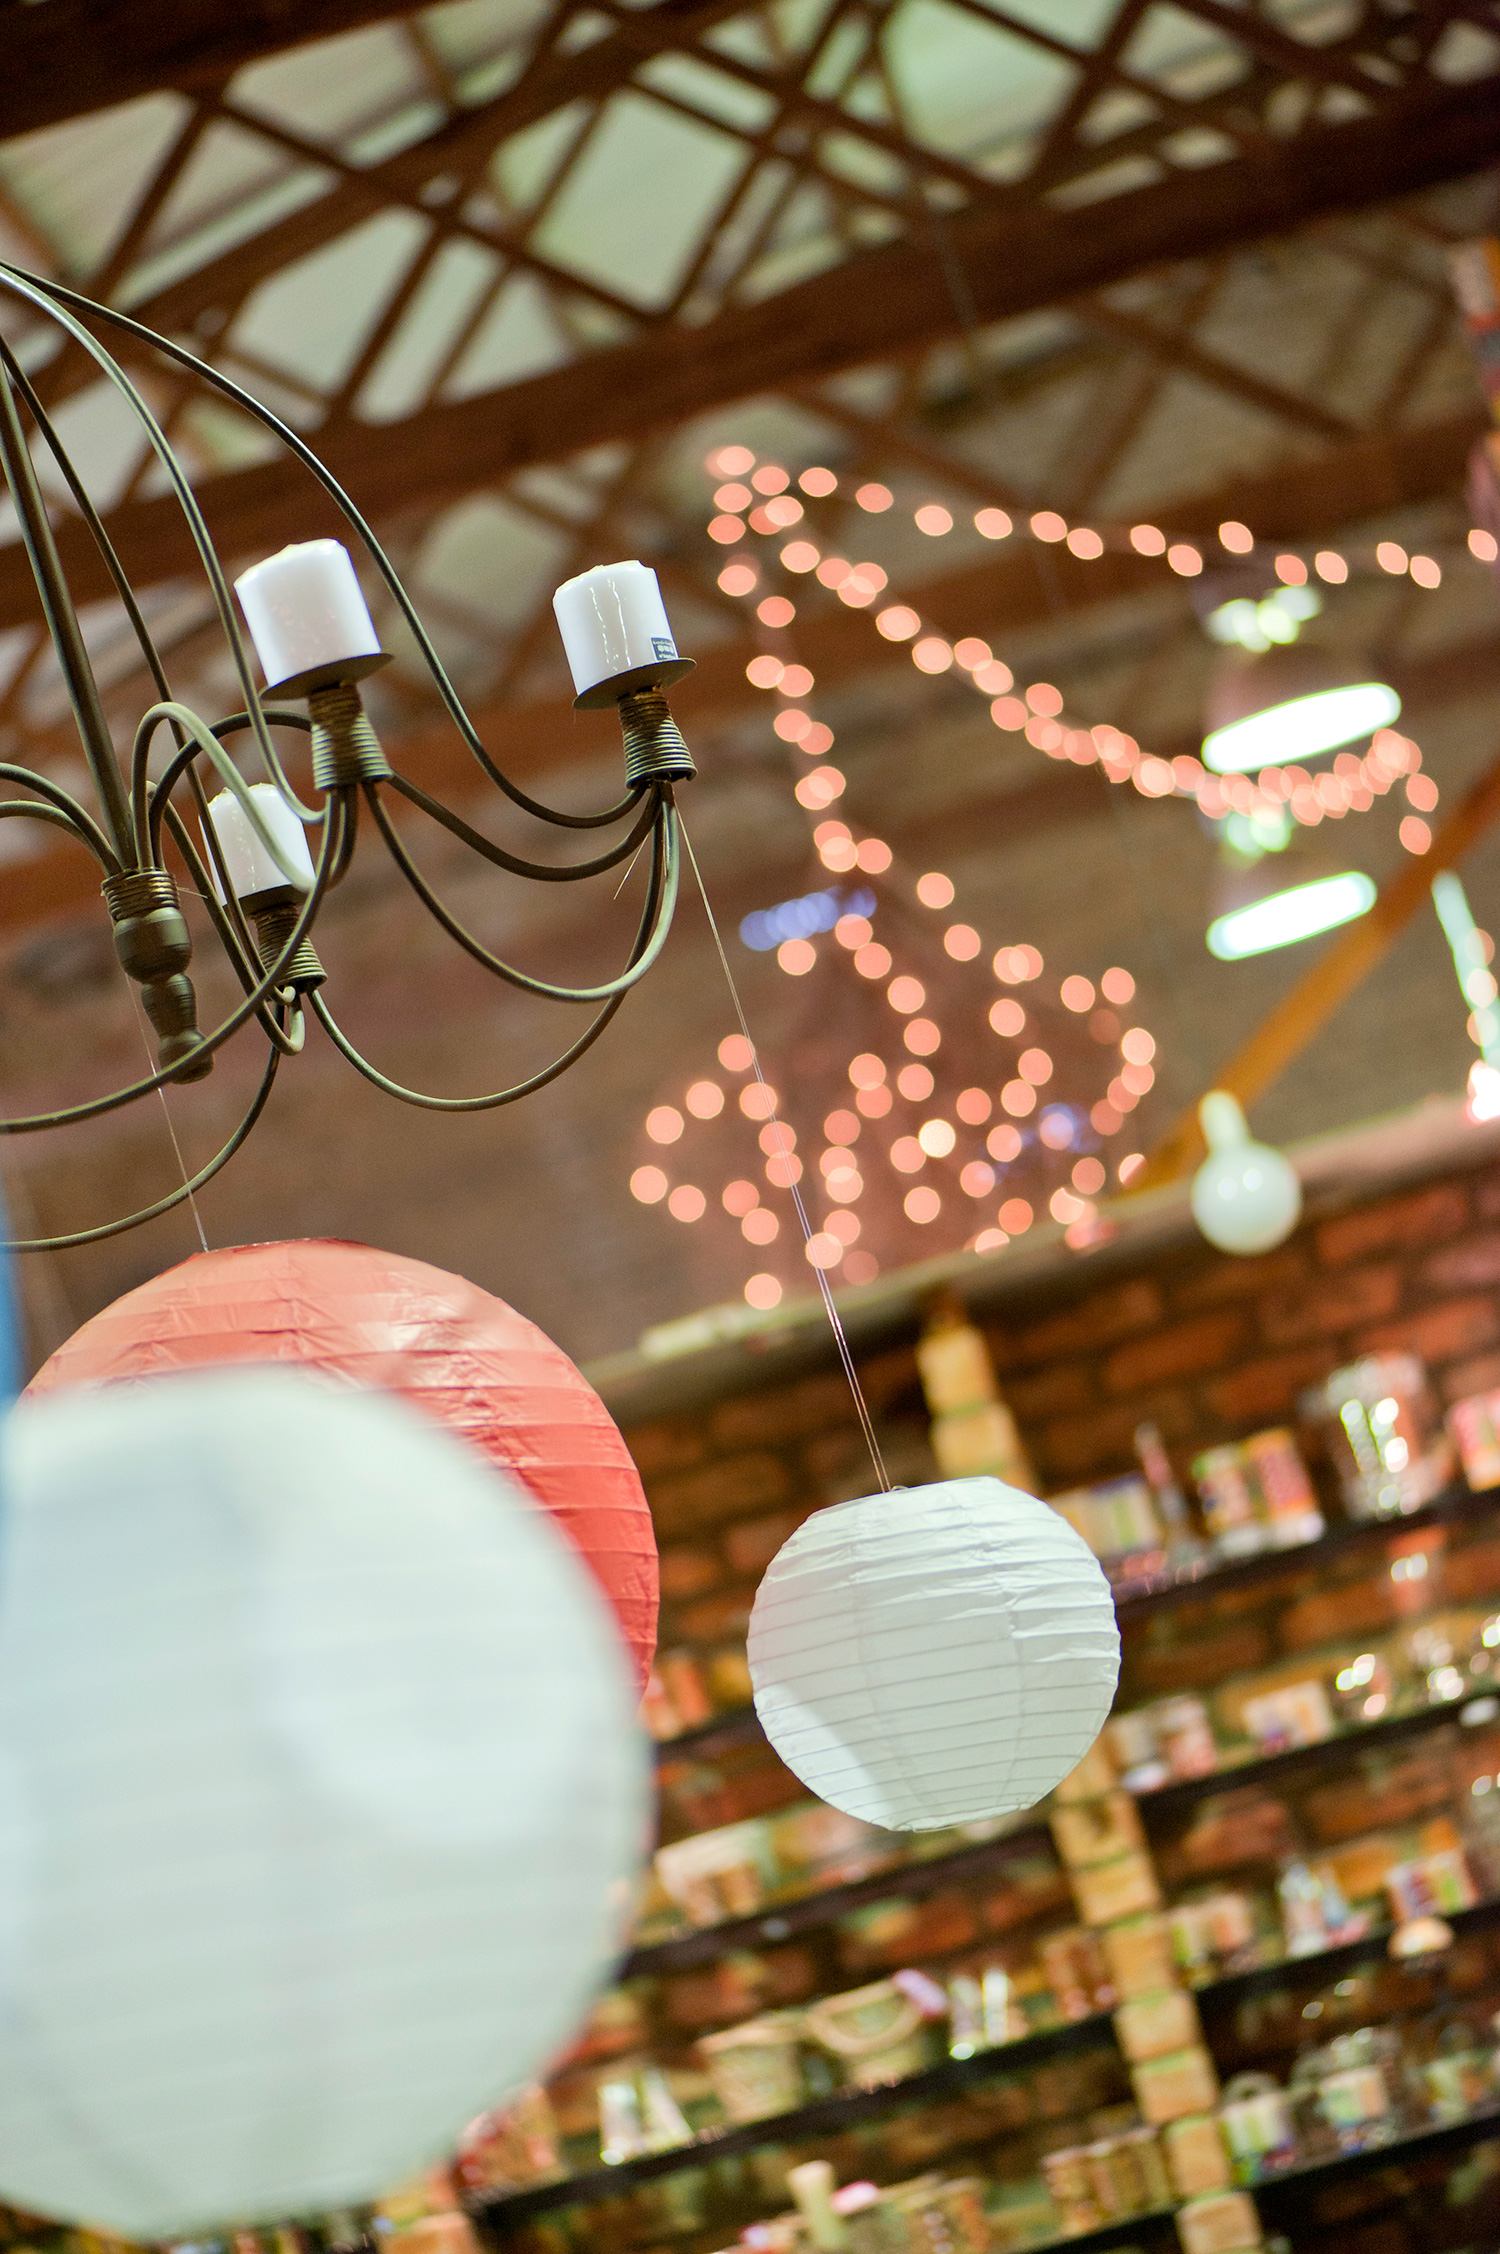 kapula-gallery-showroom-shop-handmade-candles-ceramics-lights.jpg